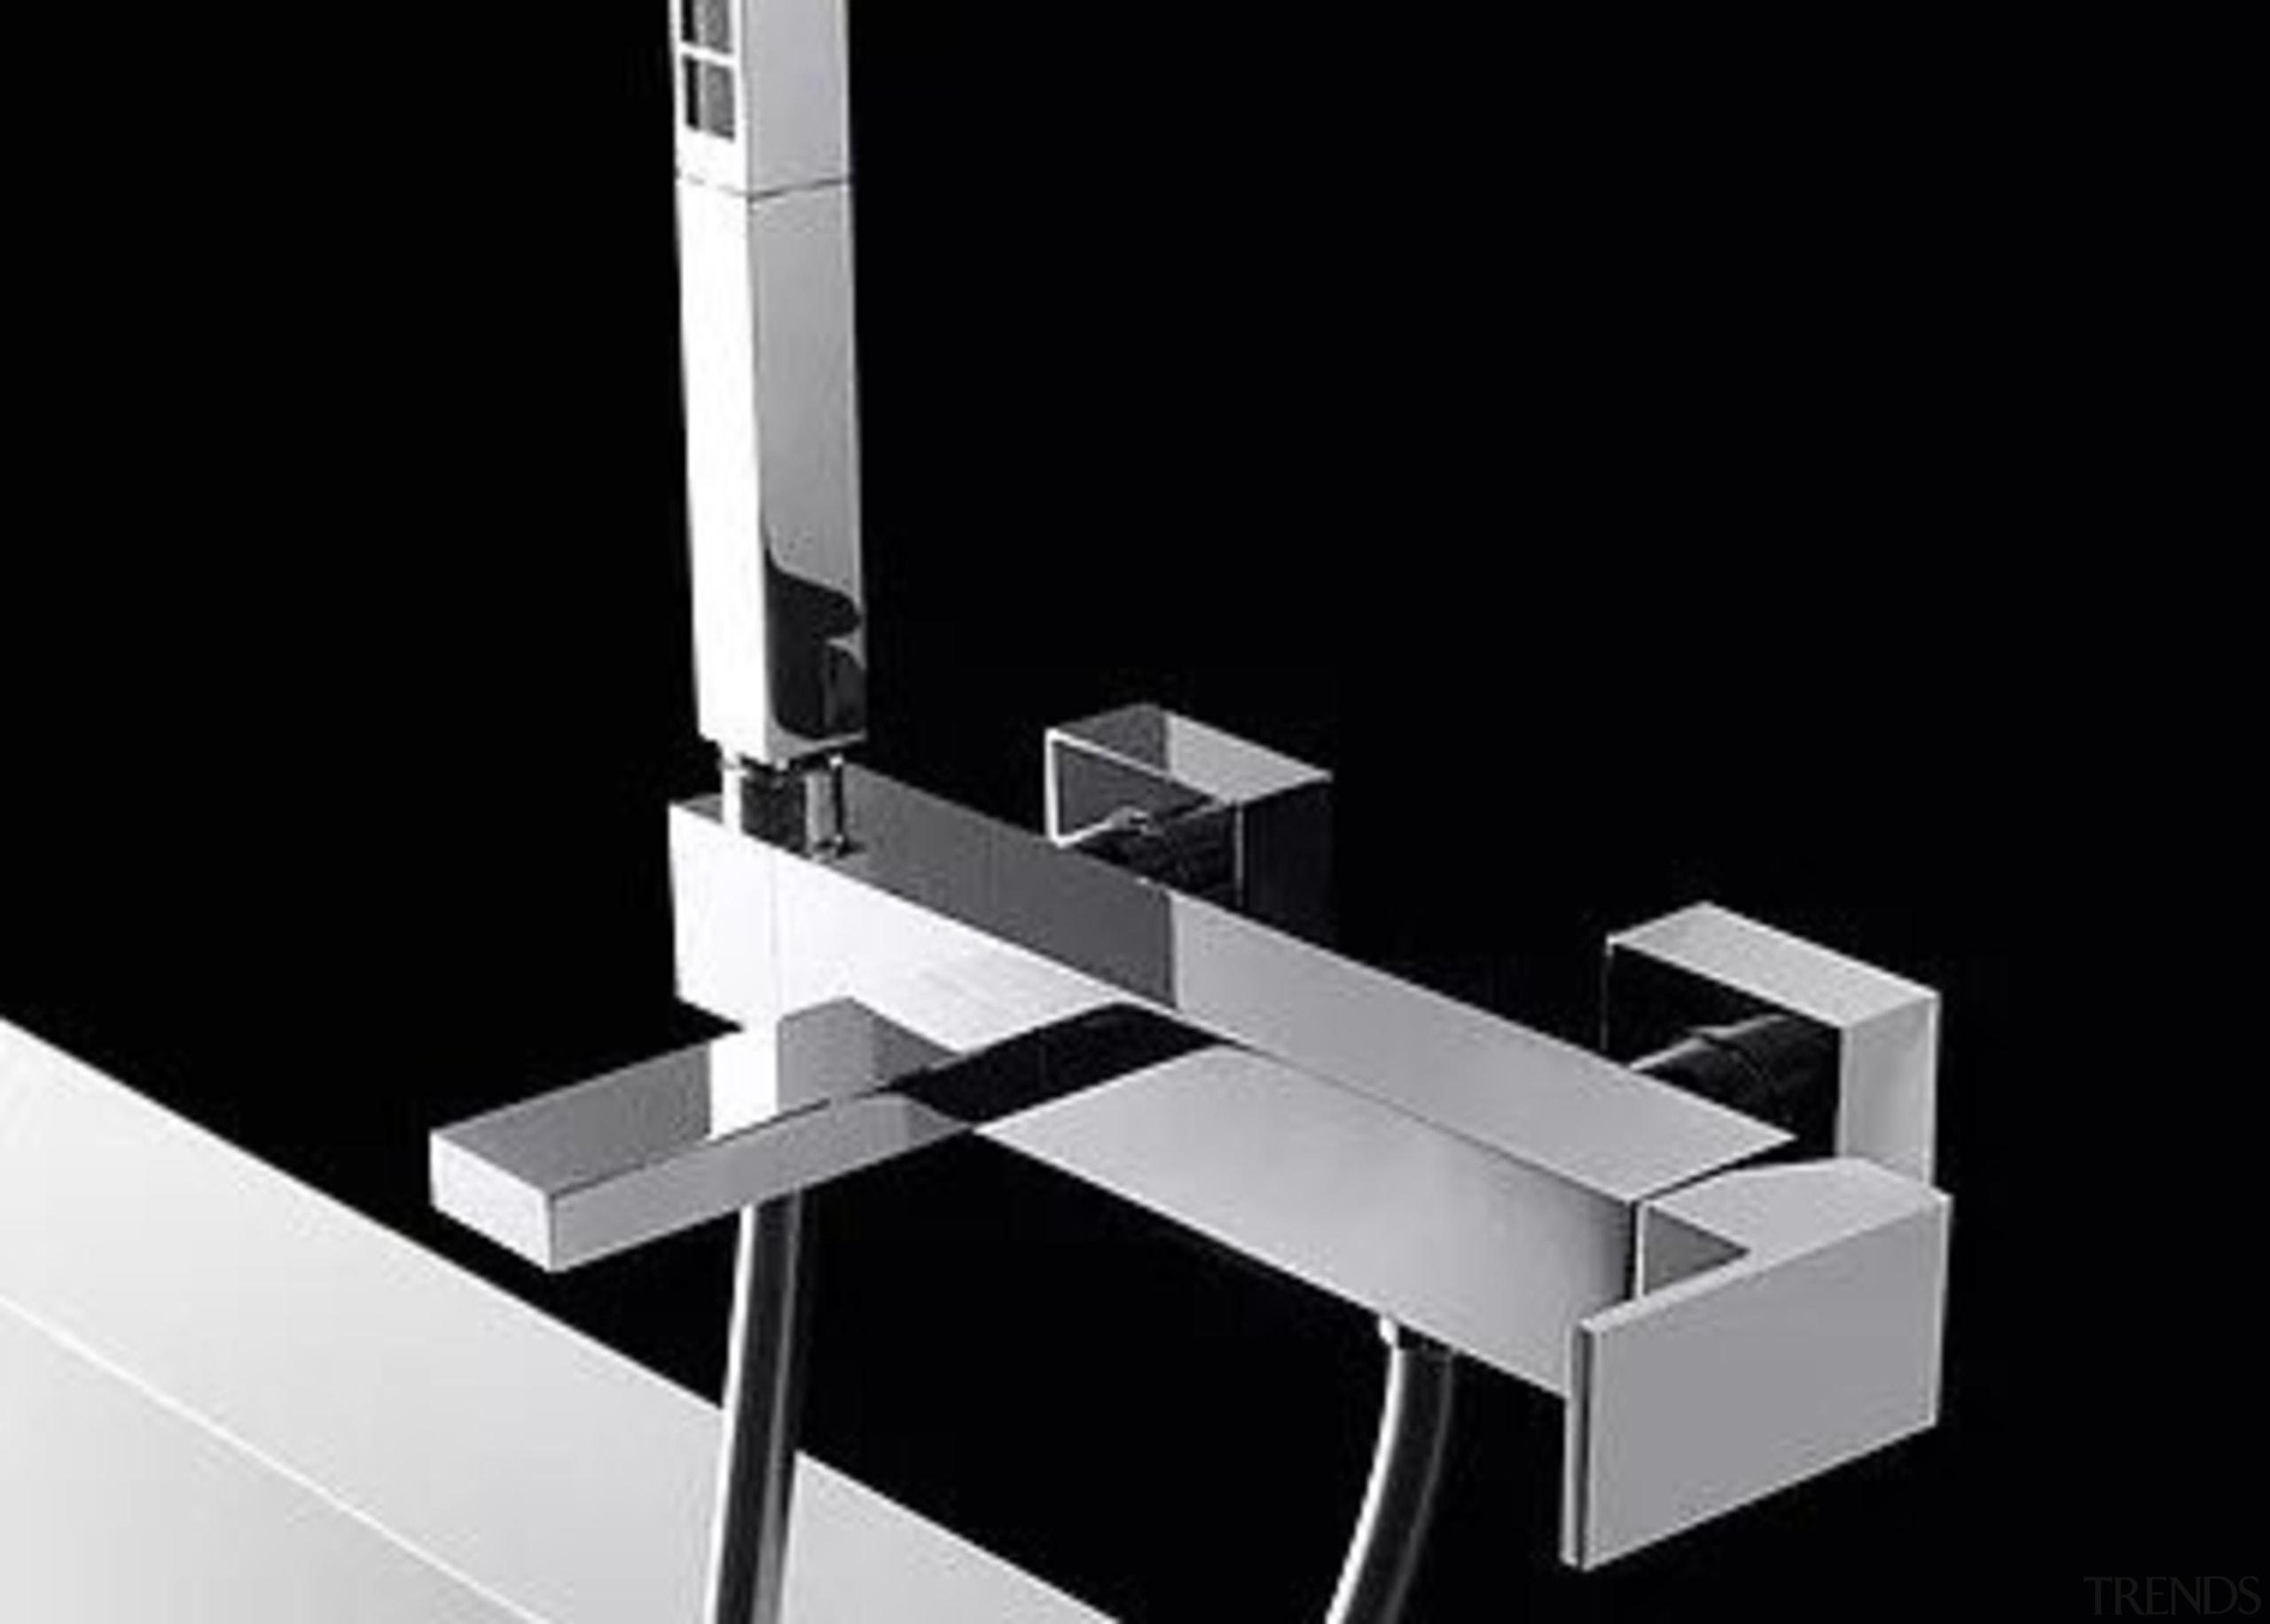 Tabs - angle | hardware | plumbing fixture angle, hardware, plumbing fixture, tap, black